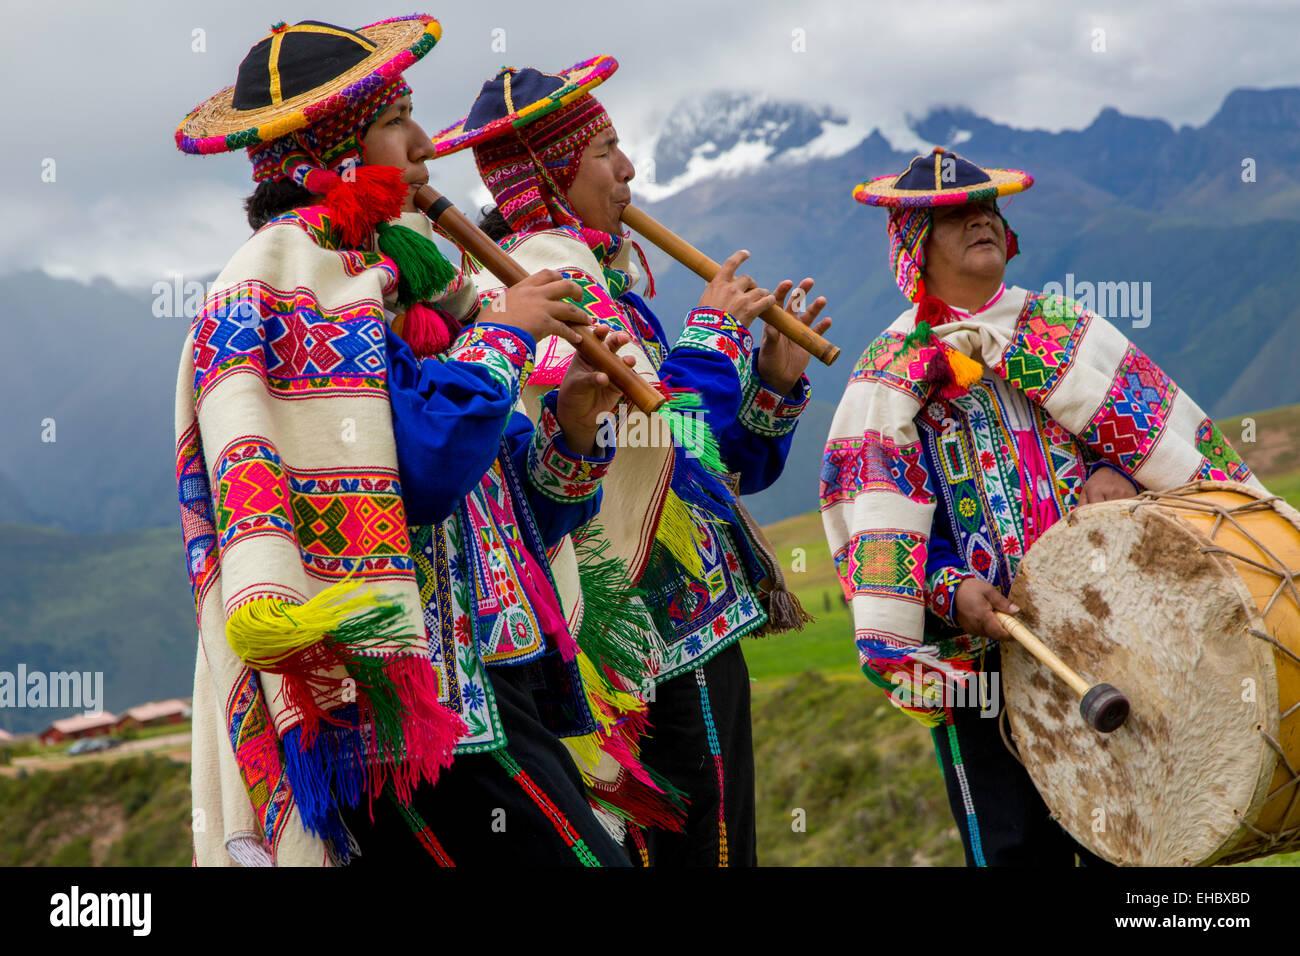 Stock Photo , Traditional Inca Dancers in costume, Inca terraces of Moray, Cusco Region, Urubamba Province, Machupicchu District, Peru